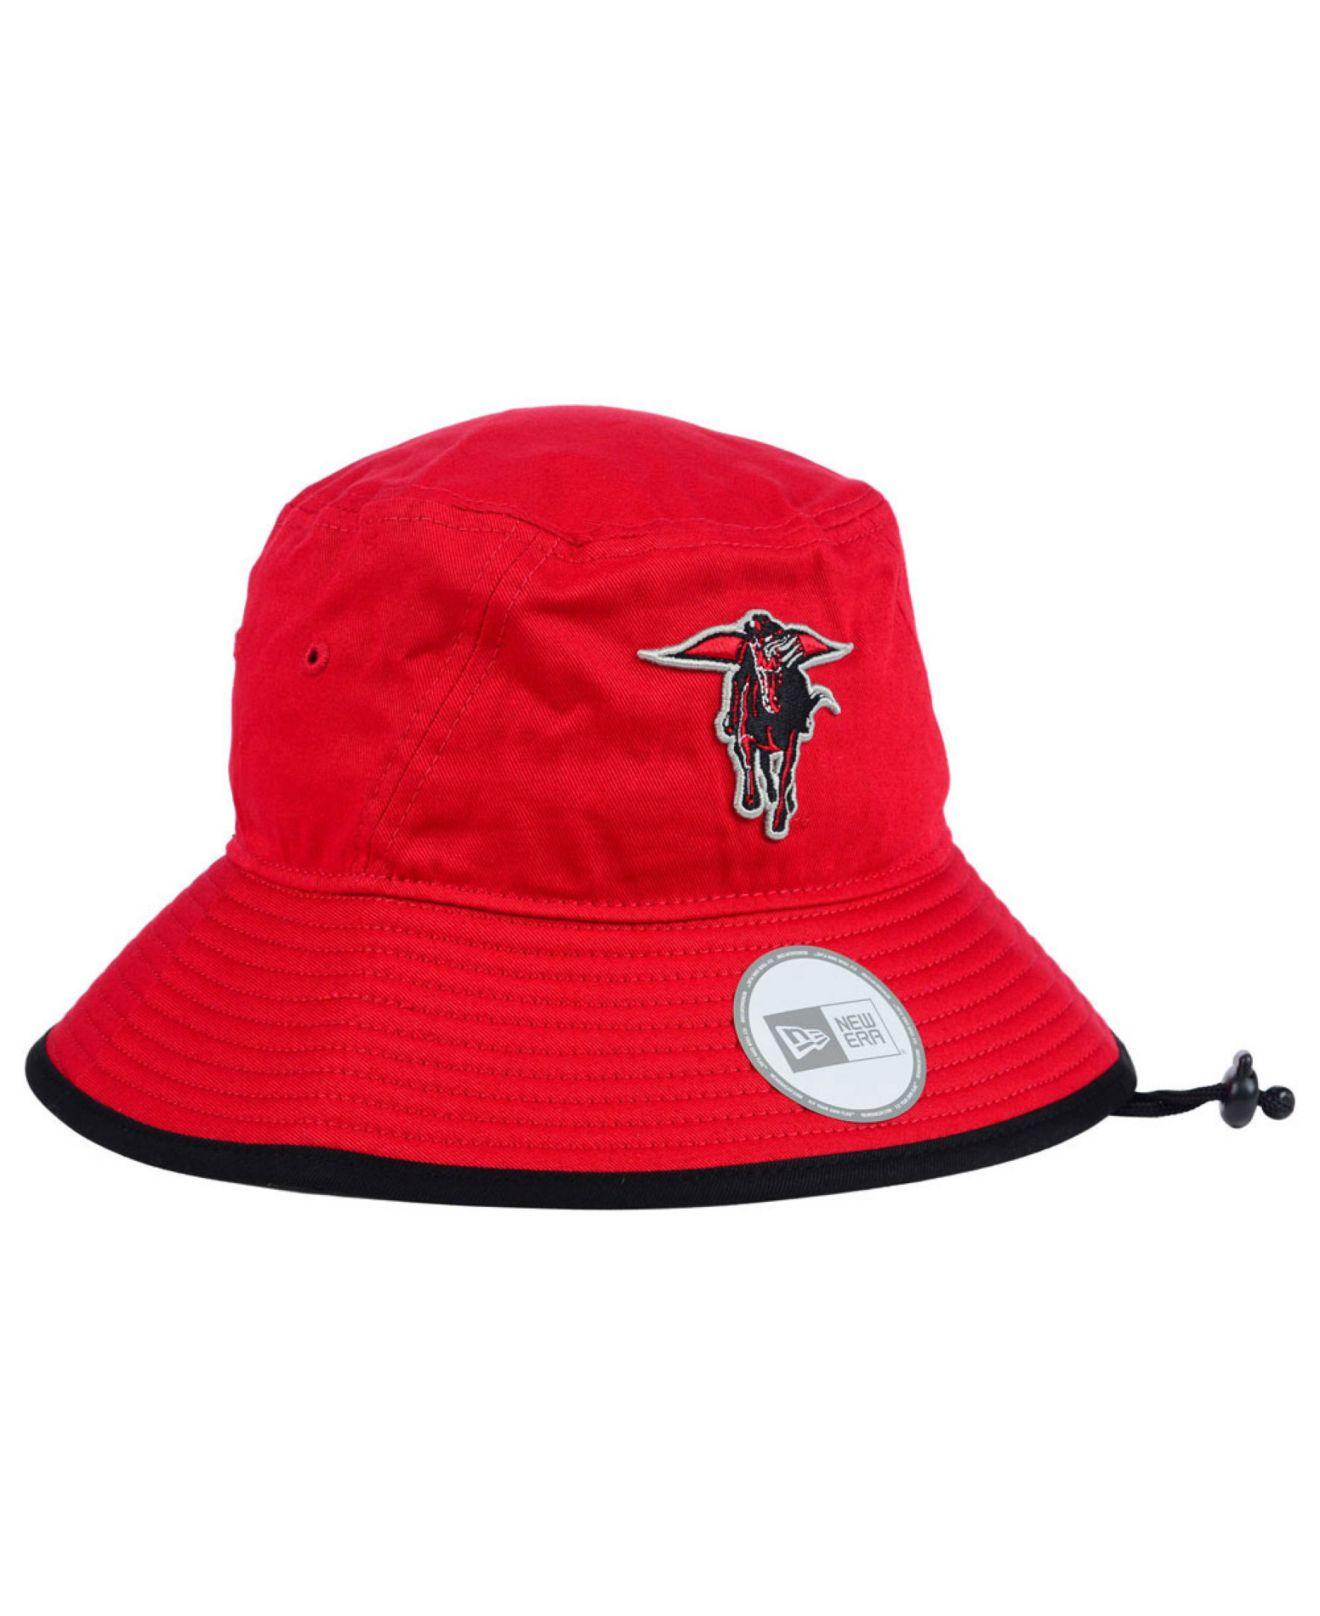 online store 8da08 7171d ... snapback hat cap 23 d9e3d 11df5  australia lyst ktz texas tech red  raiders tip bucket hat in red for men b54c4 91488